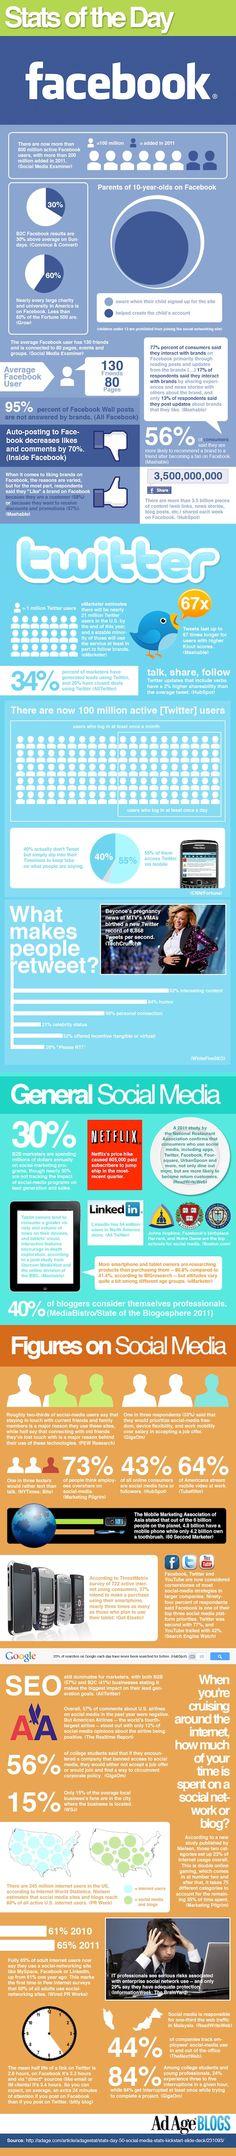 Médias sociaux en 2011